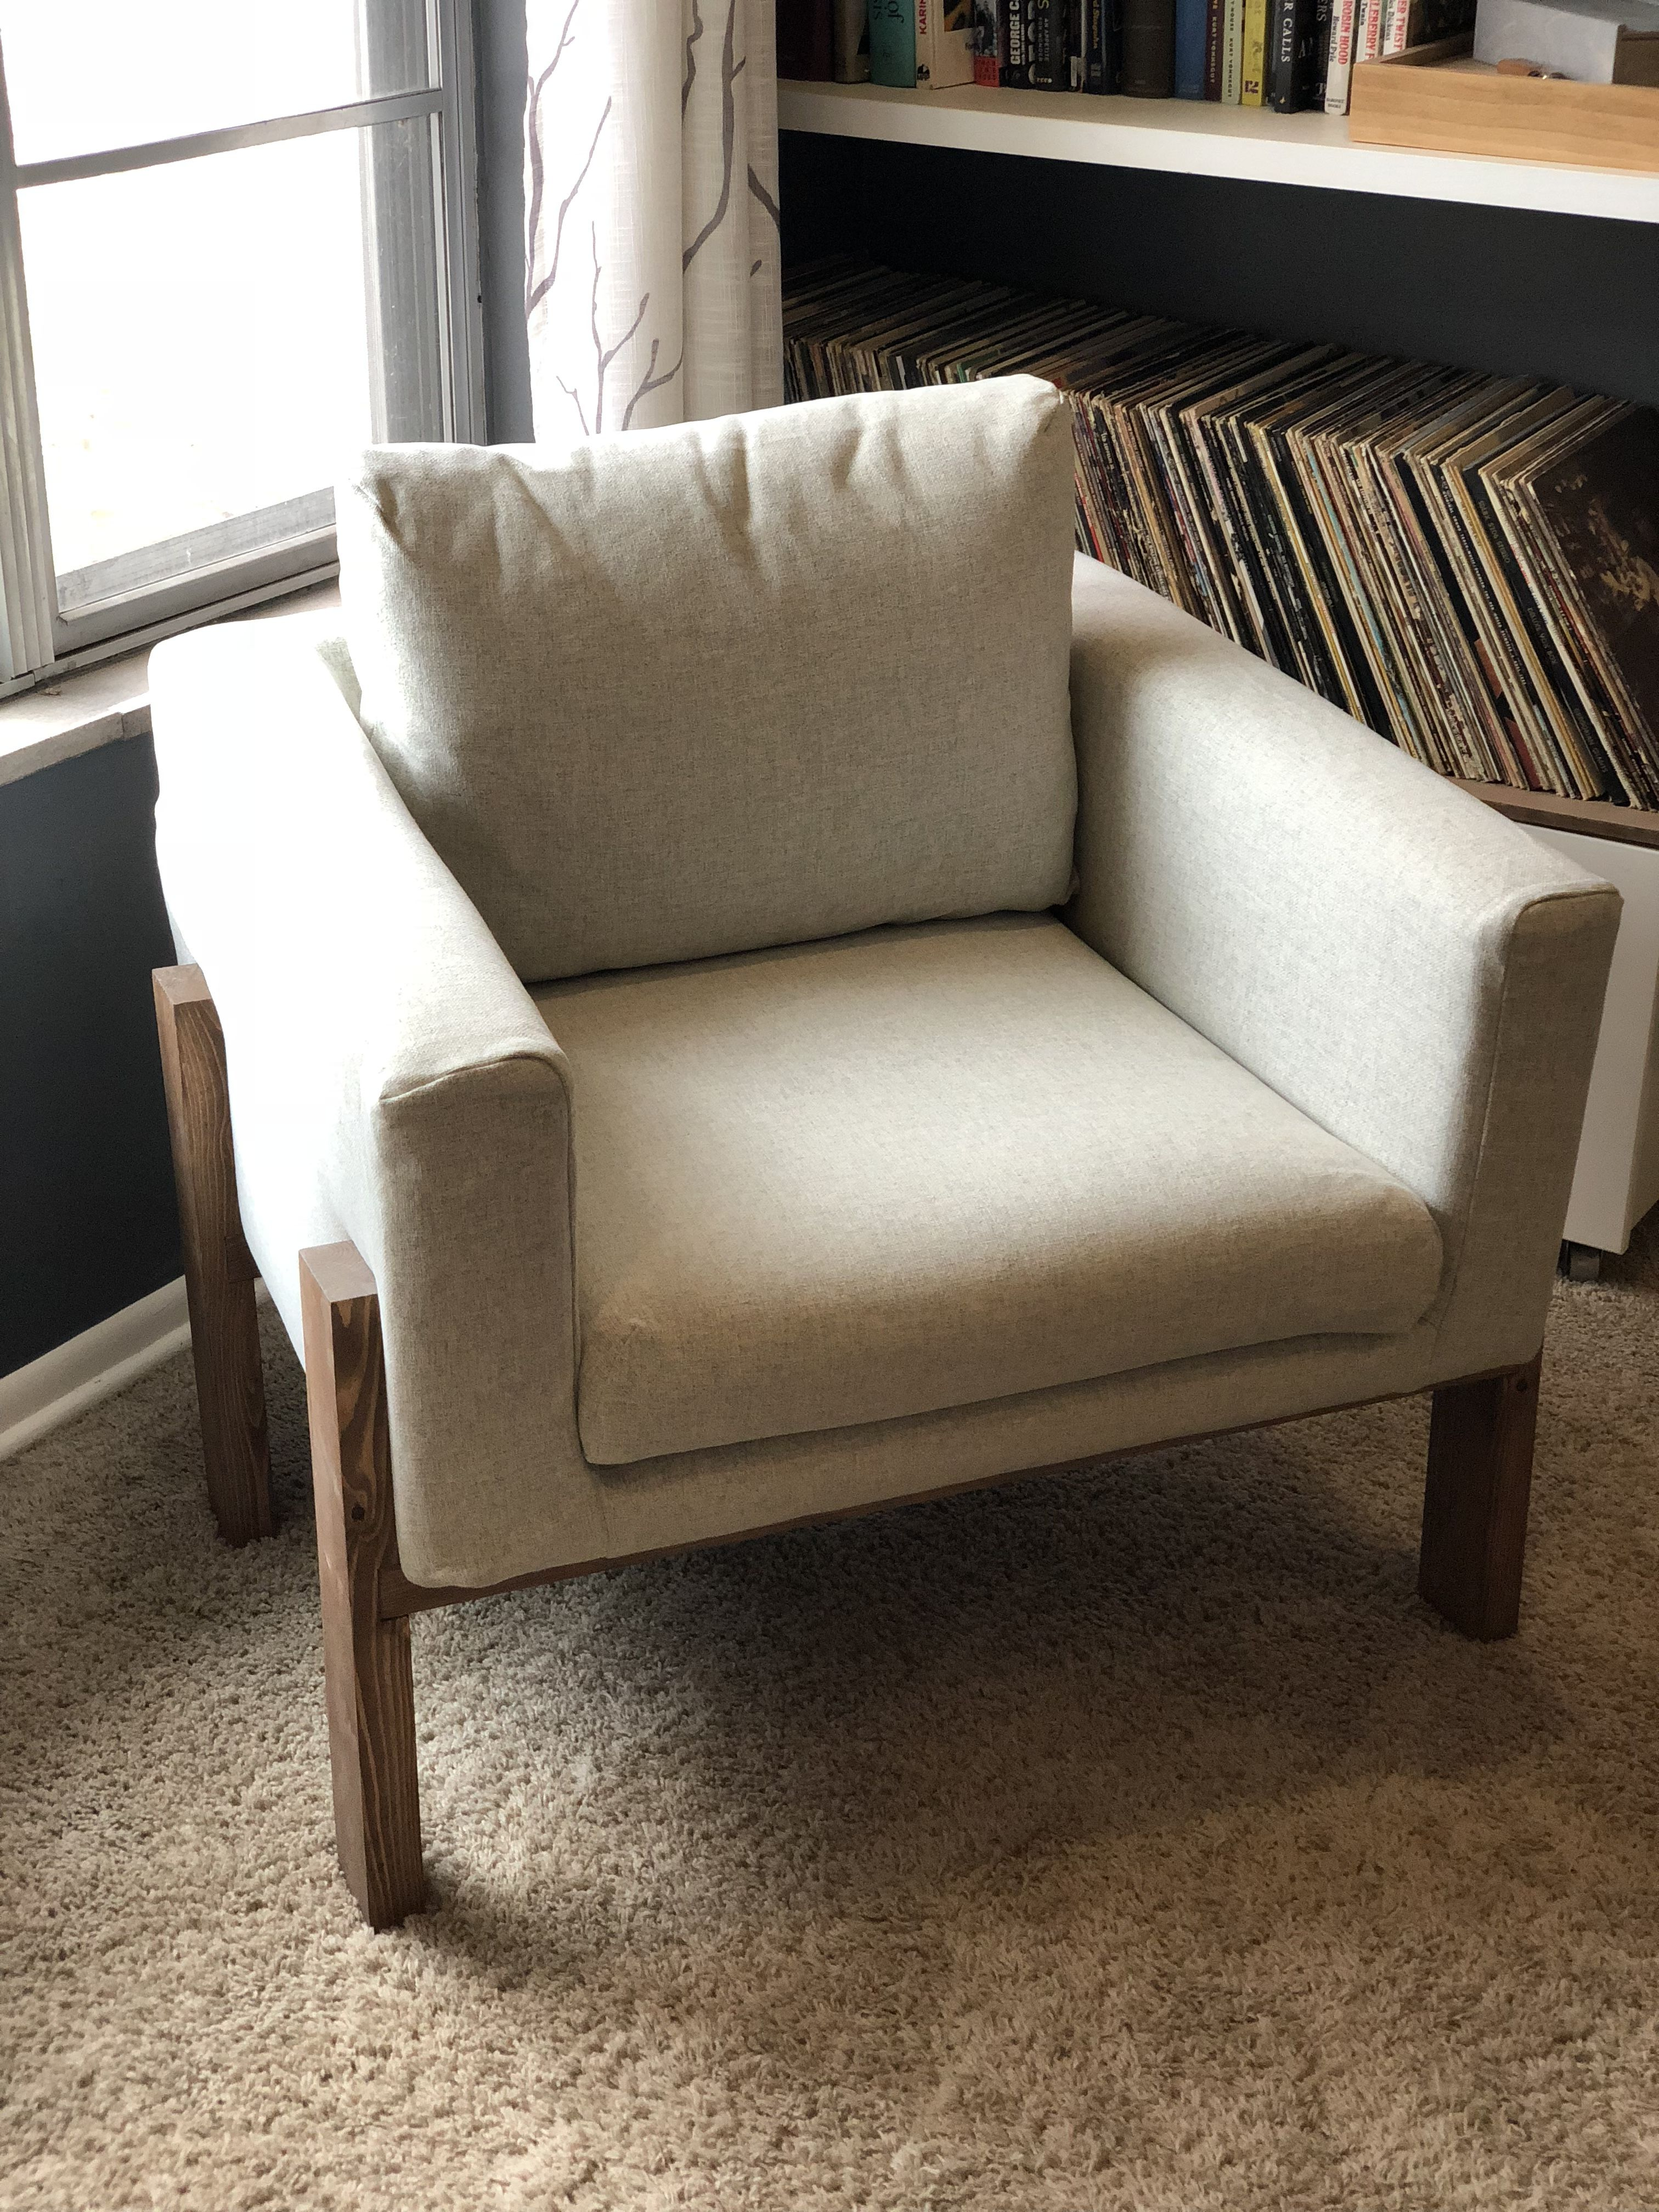 IKEA Koarp chair with new legs Chair design, Arm chairs